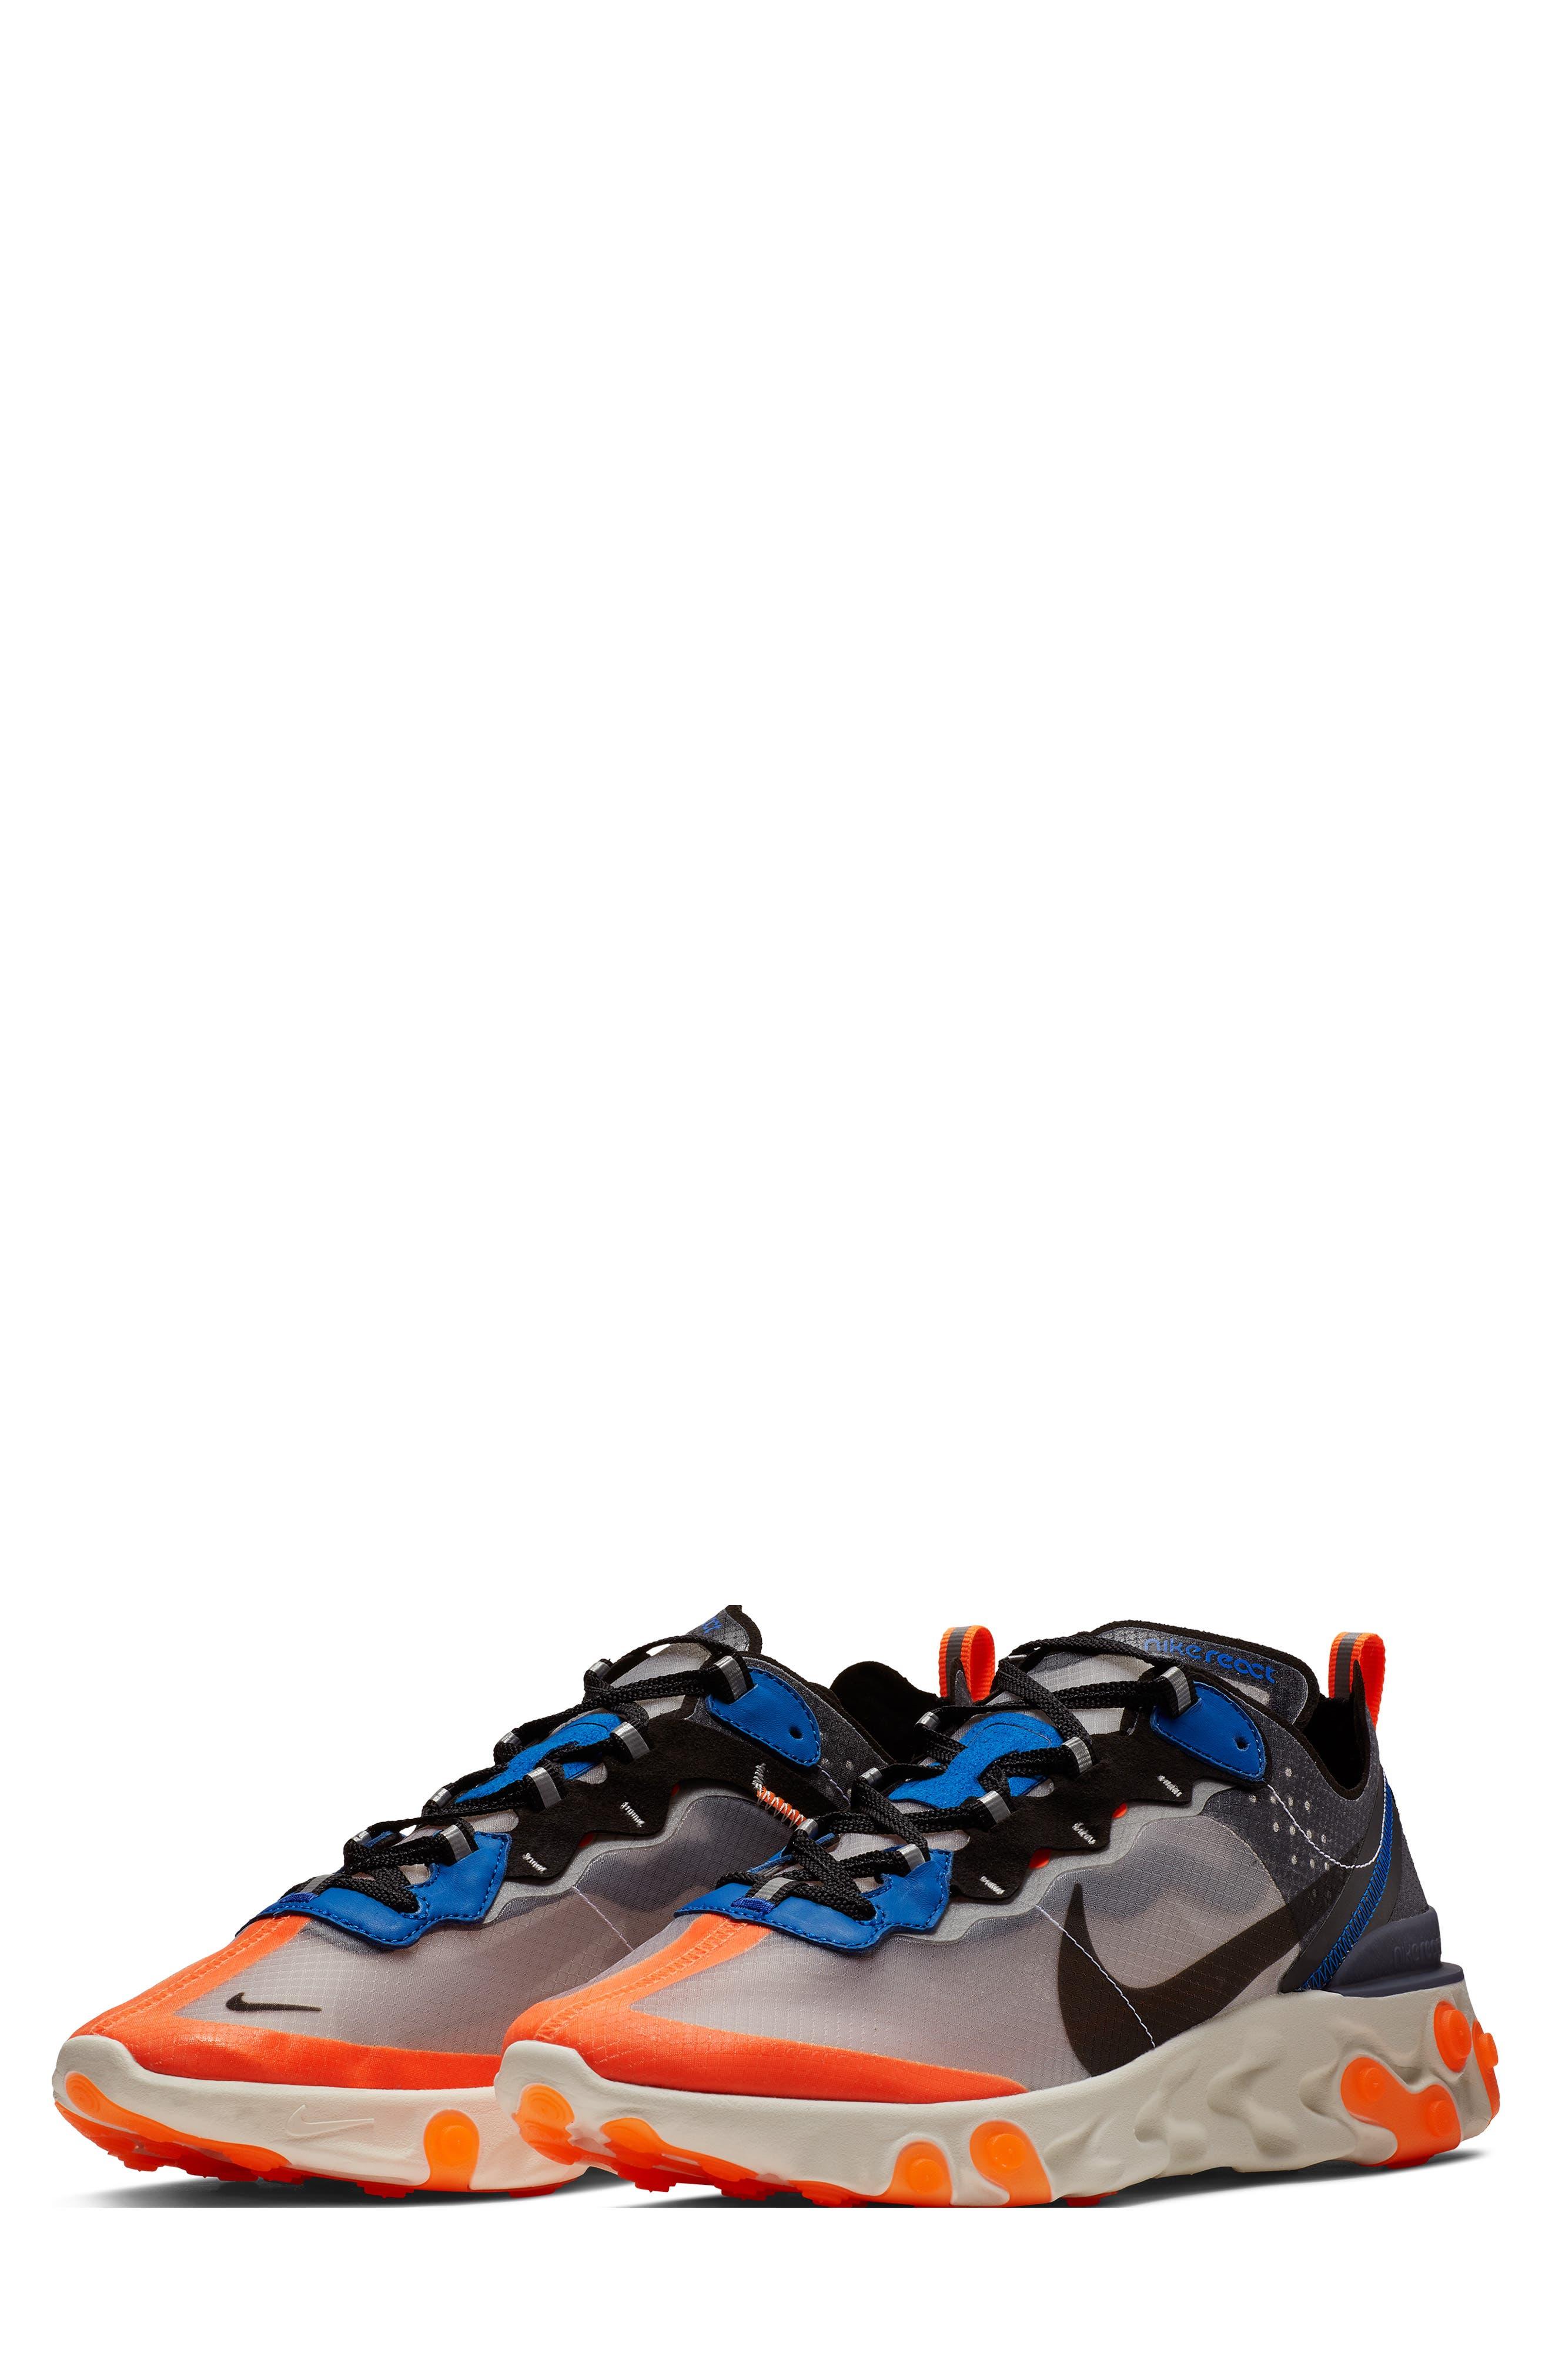 React Element 87 Sneaker,                         Main,                         color, 021